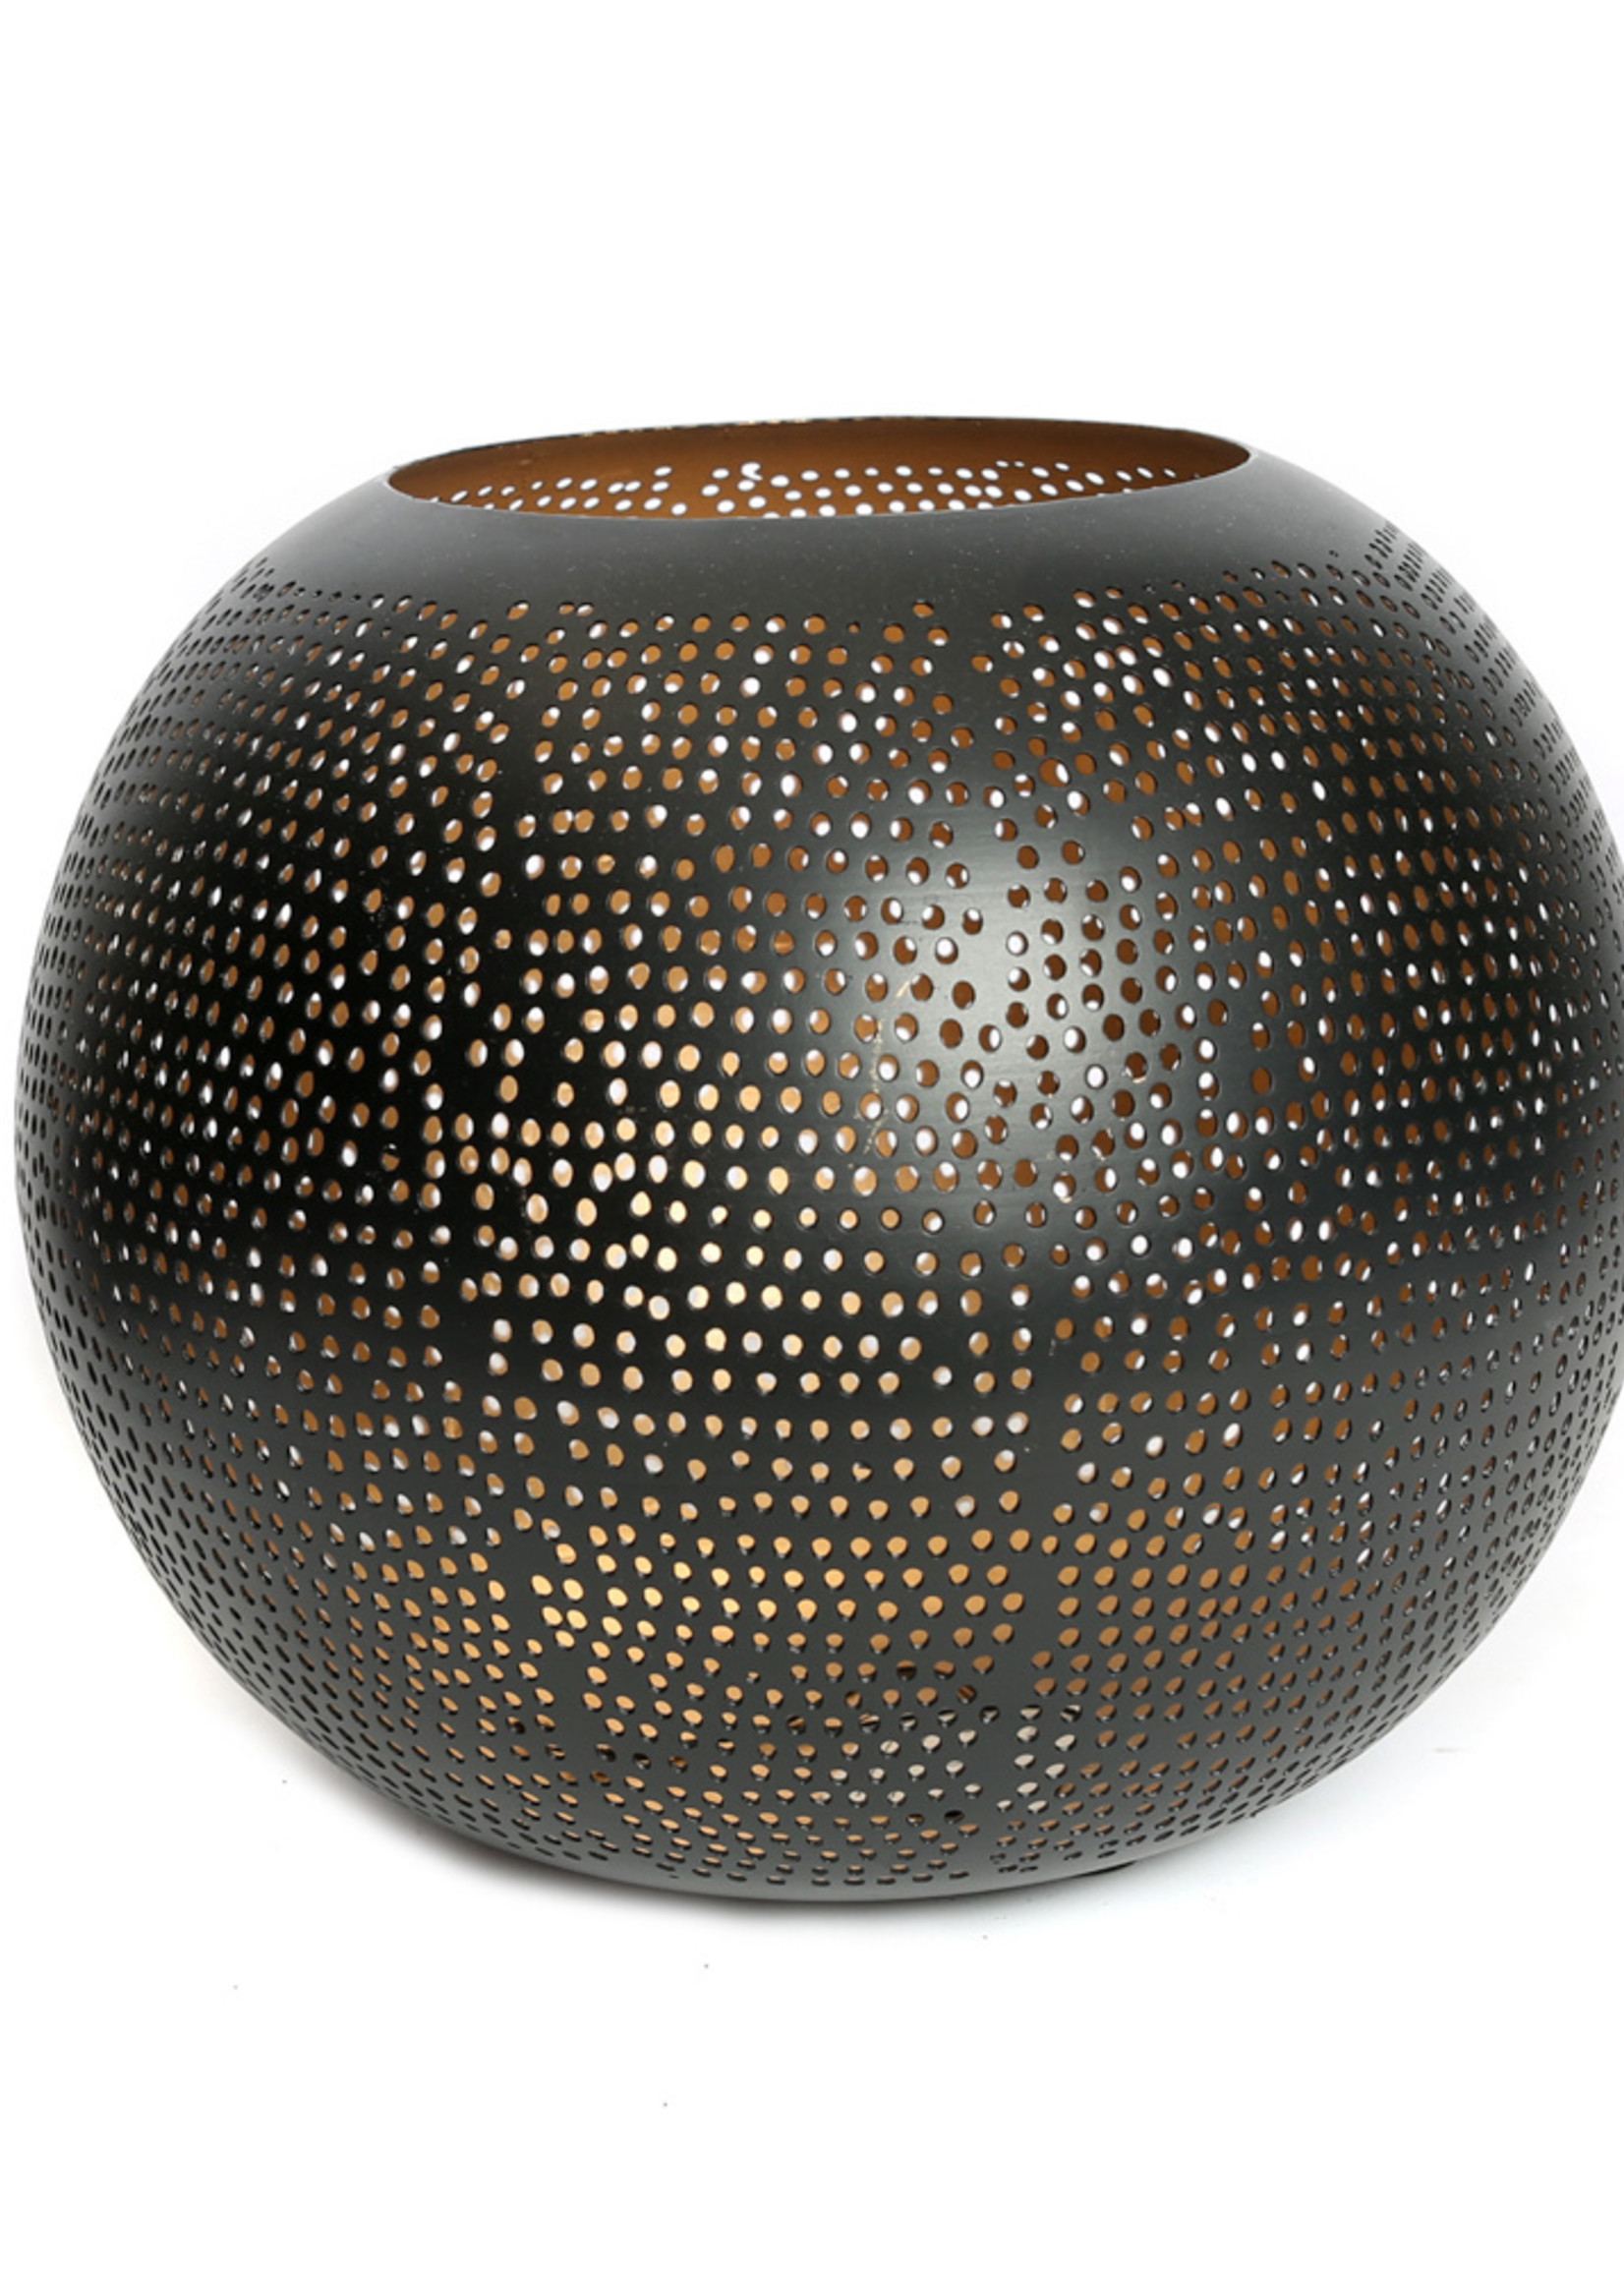 The Pierced Ball - Black Gold - L